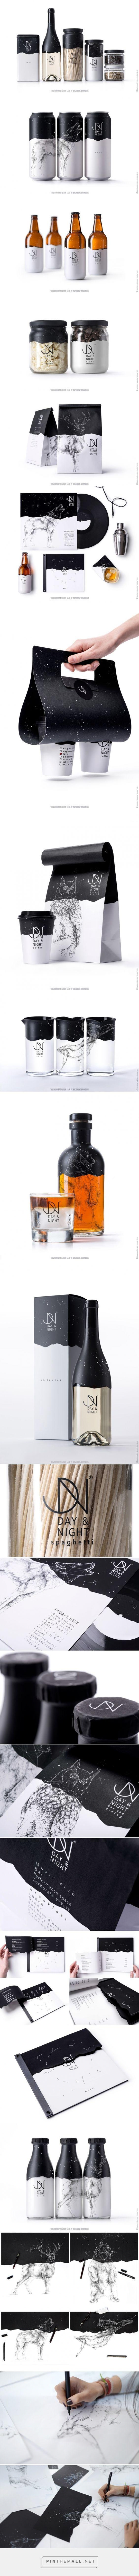 Day & Night packaging designed by Backbone Branding (Armenia) - http://www.packagingoftheworld.com/2016/03/day-night.html: